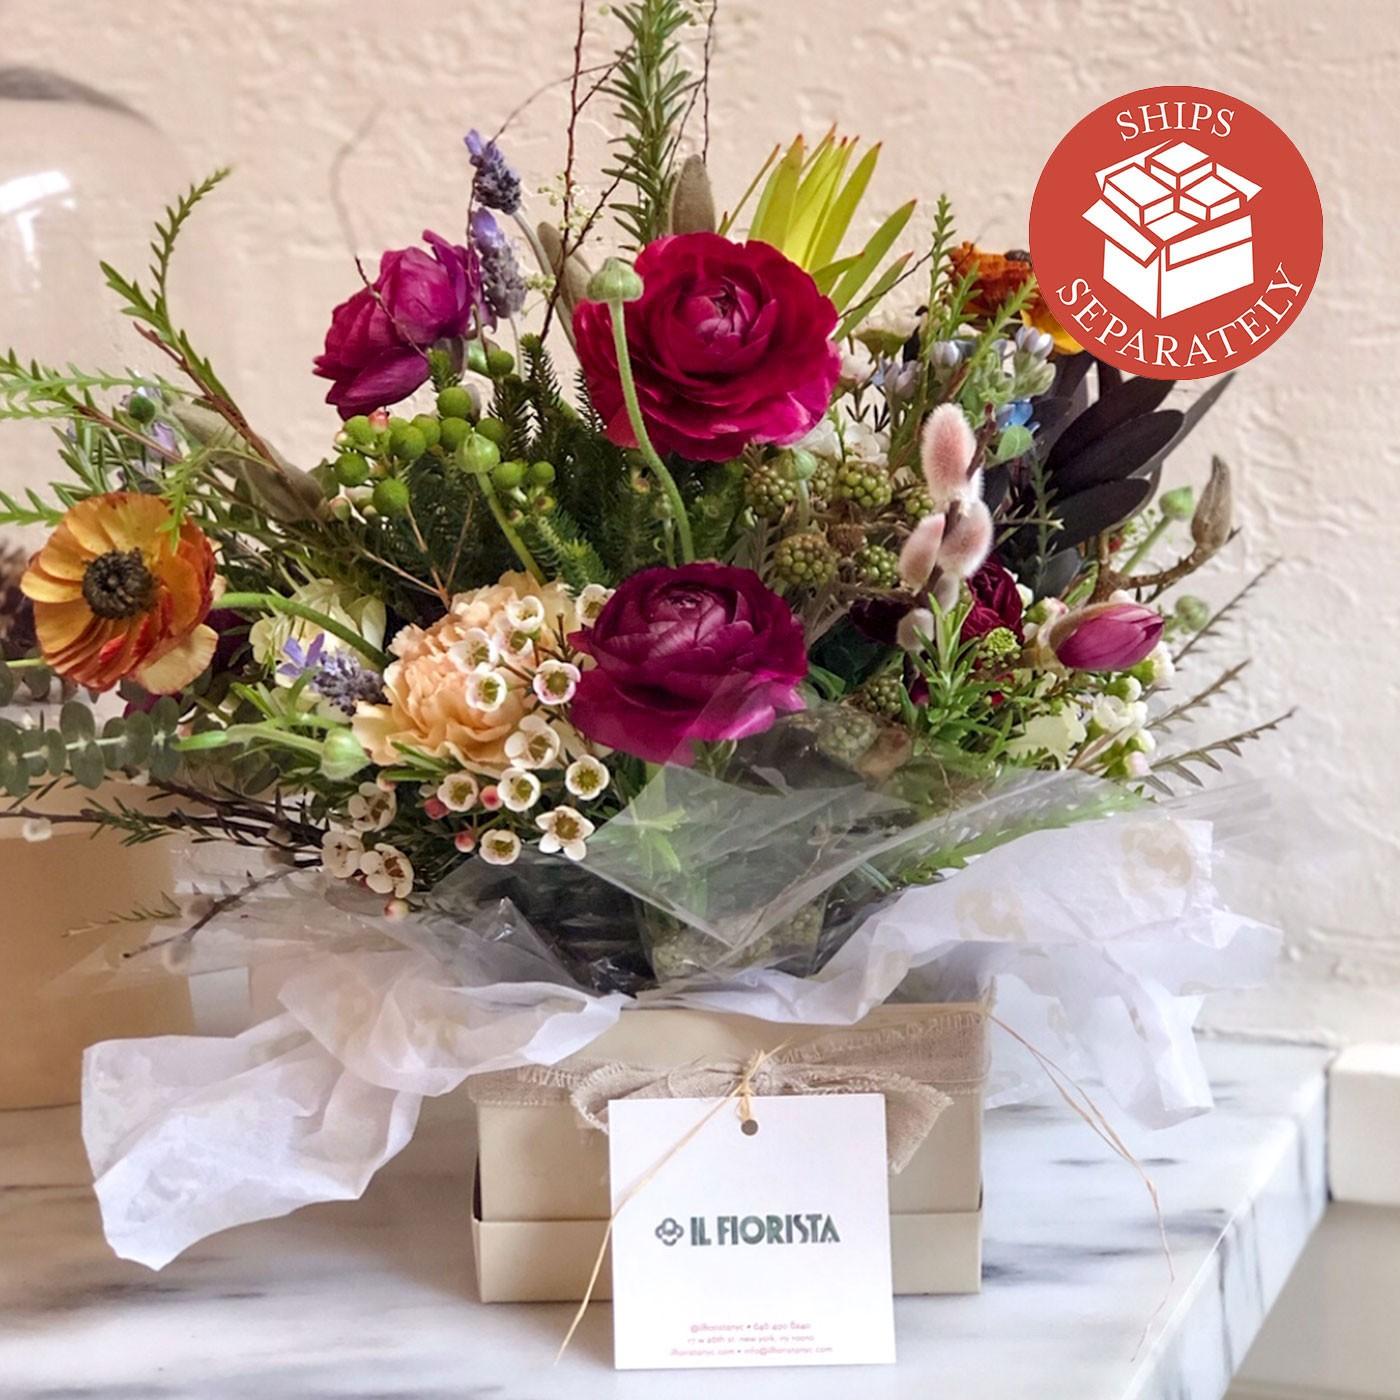 Flower Arrangment with Glass Vase - Il Fiorista | Eataly.com